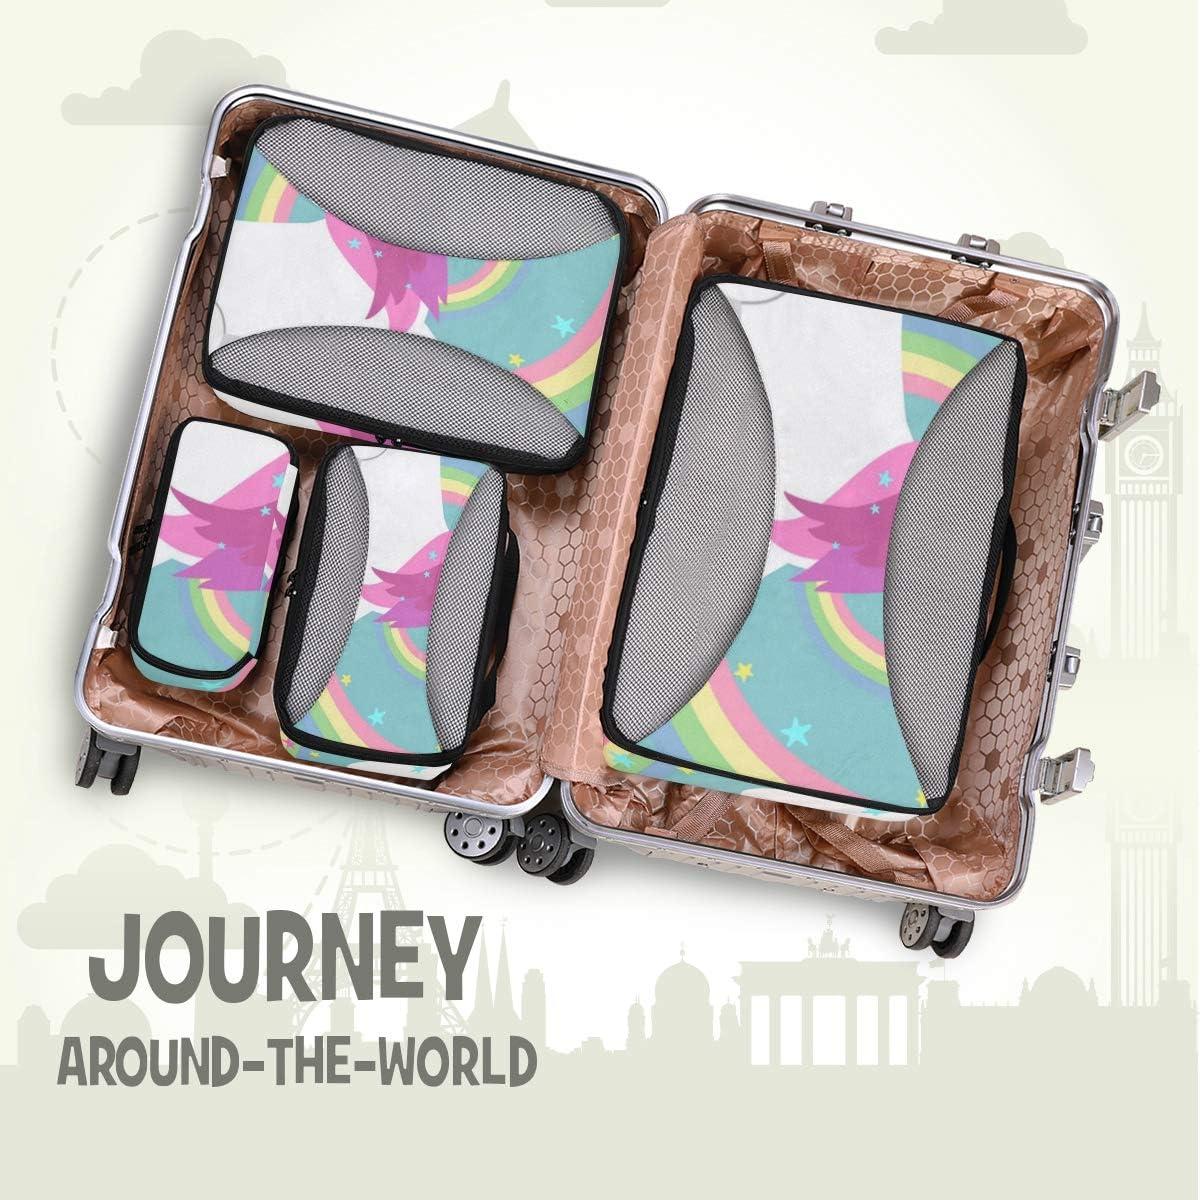 4 Set Packing Cubes Travel Luggage Packing Organizers Colored Rainbow Unicorn